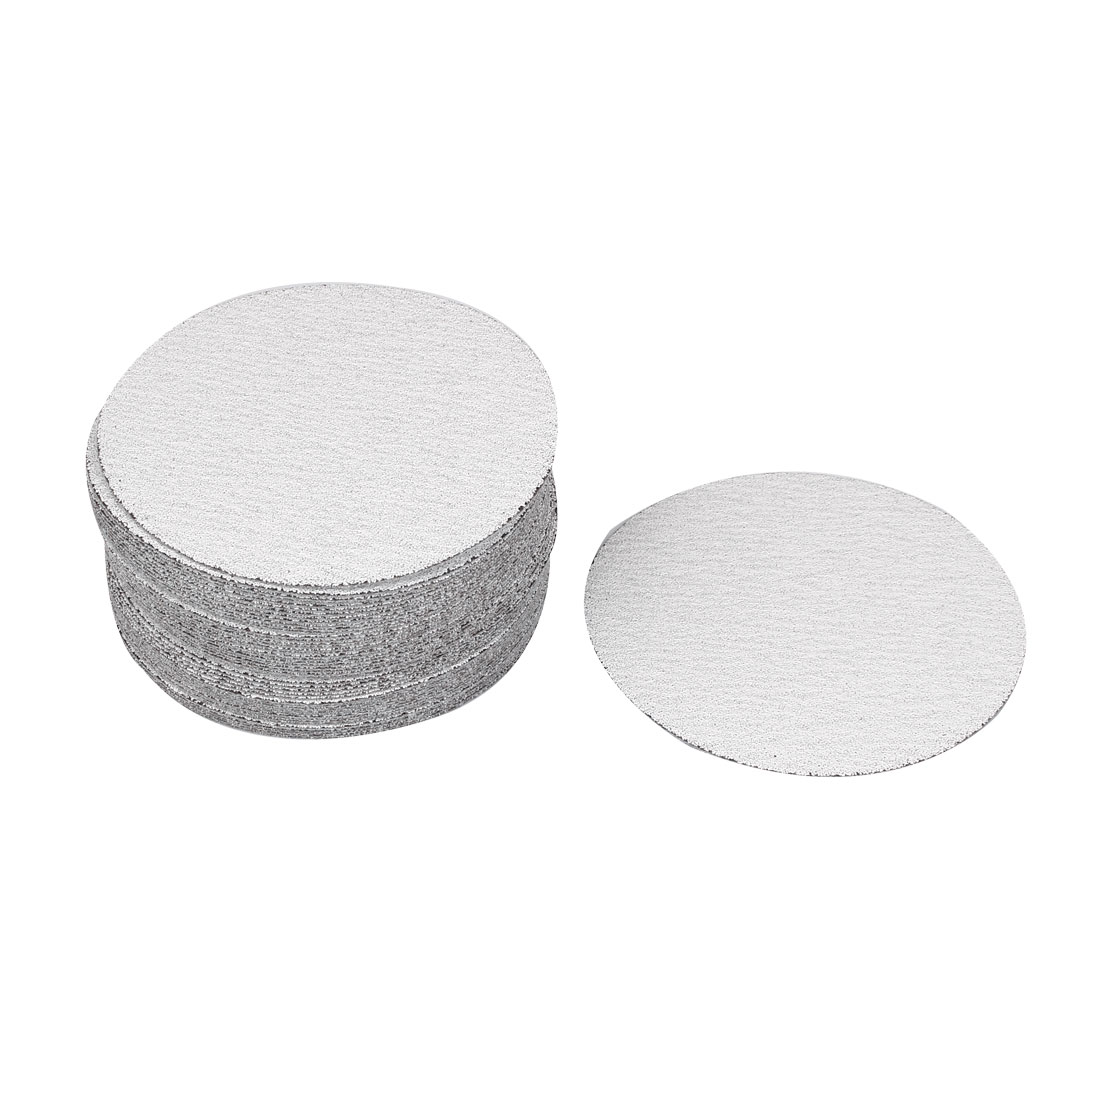 "5"" Dia Polishing Round Dry Abrasive Sanding Sandpaper Sheet Disc 80 Grit 50 Pcs"